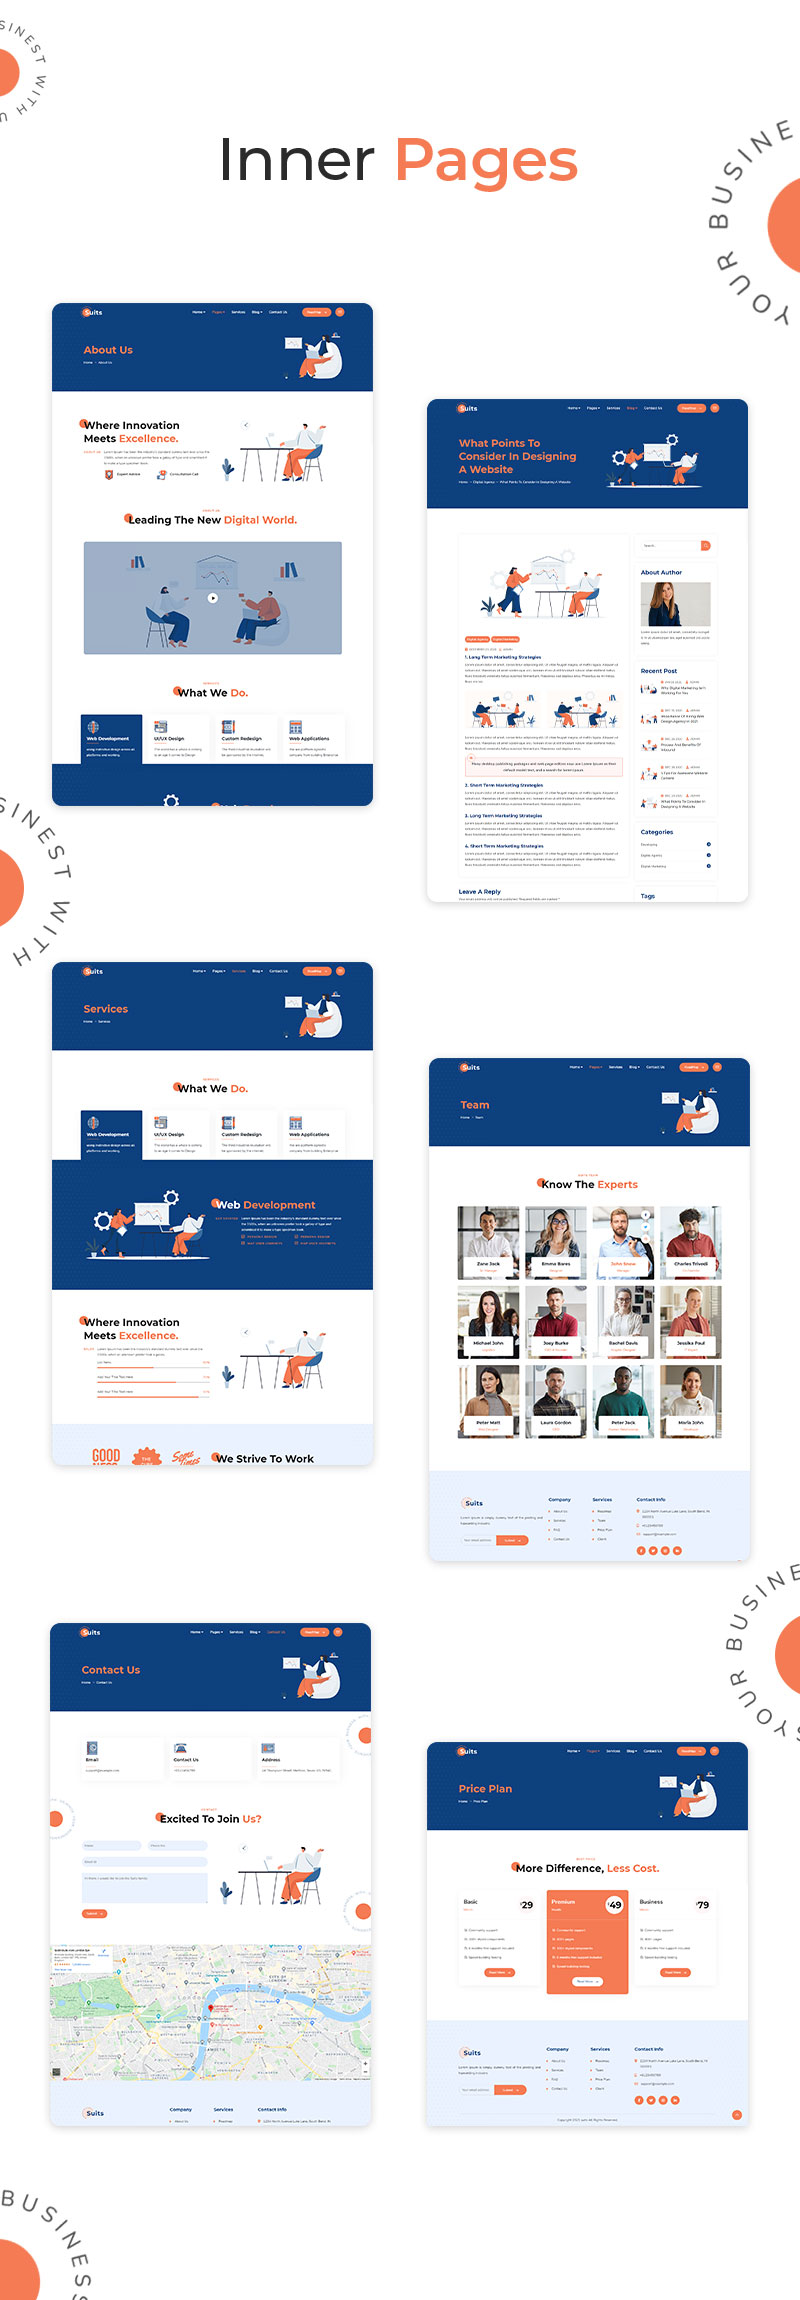 Suitss   Startup Business WordPress theme - 9 startup business wordpress theme Suitss 05 inner pages